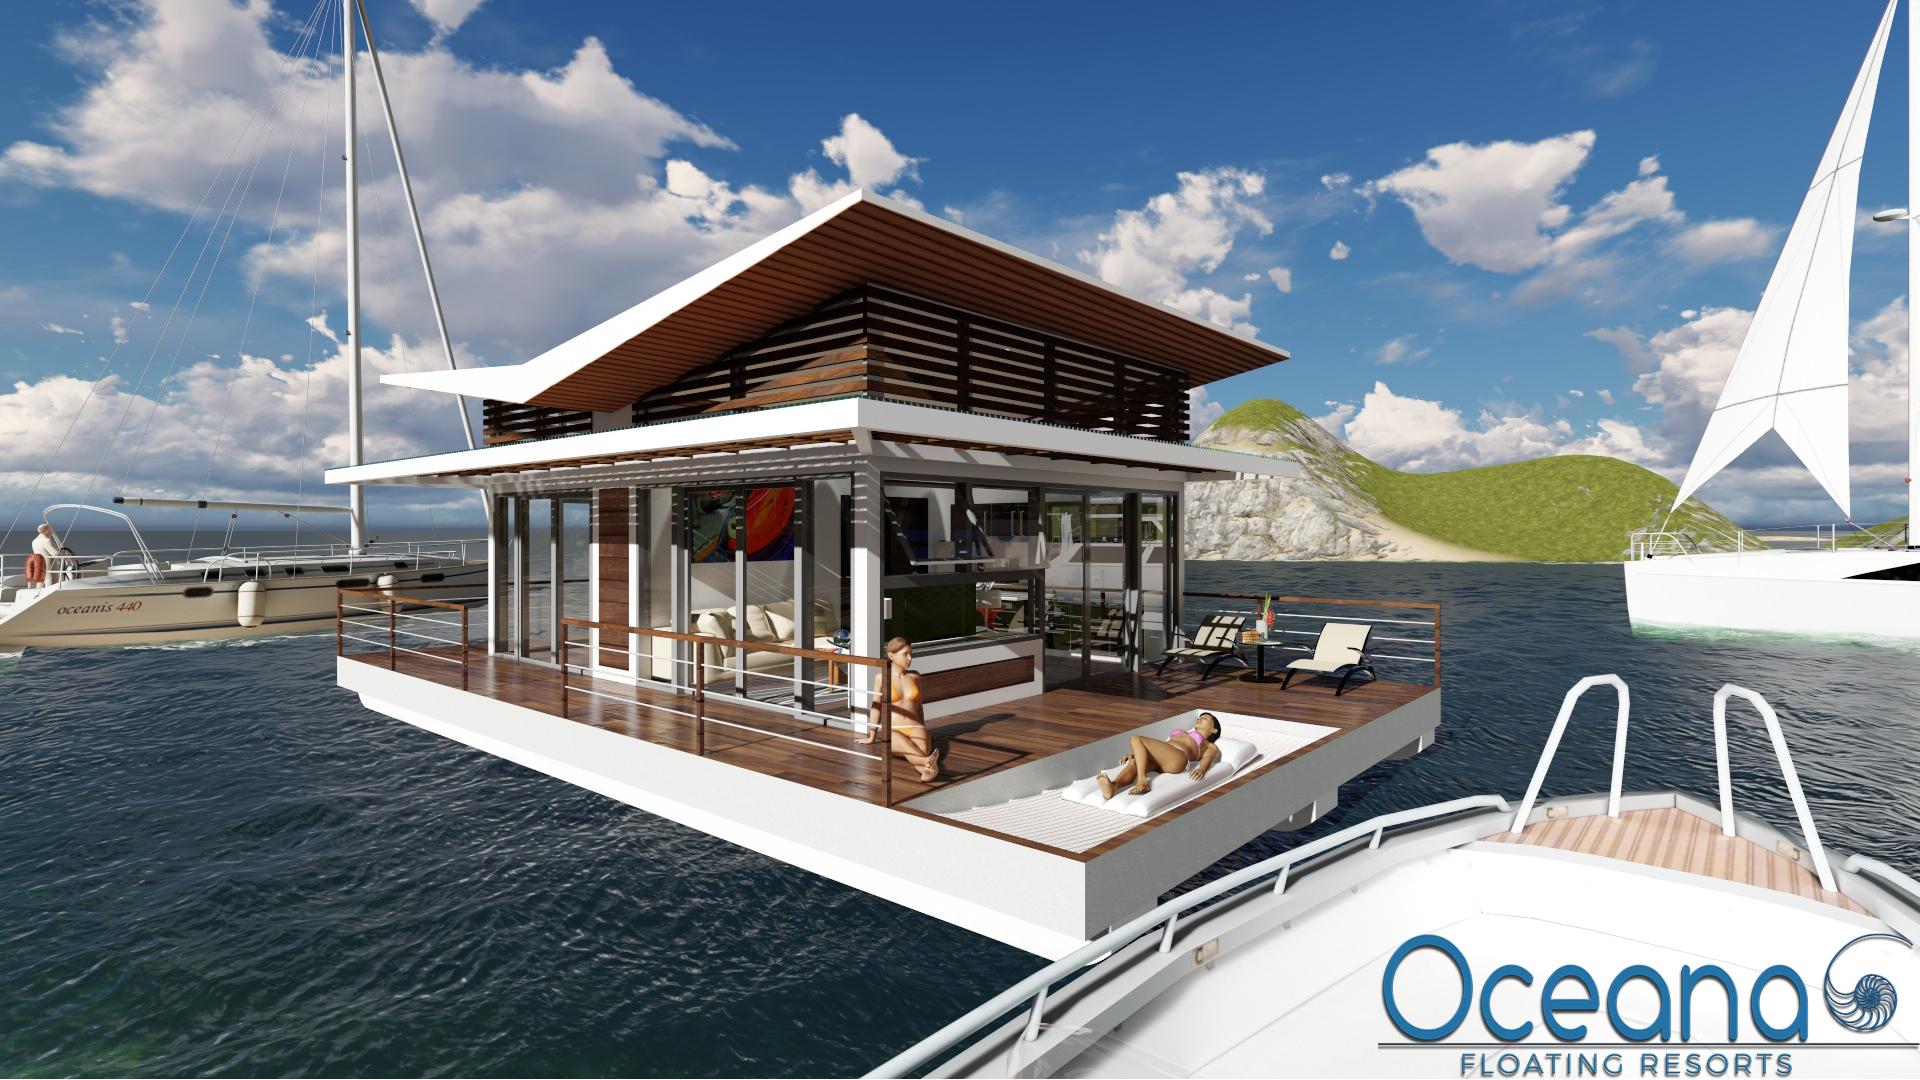 Oceana Floating Resort